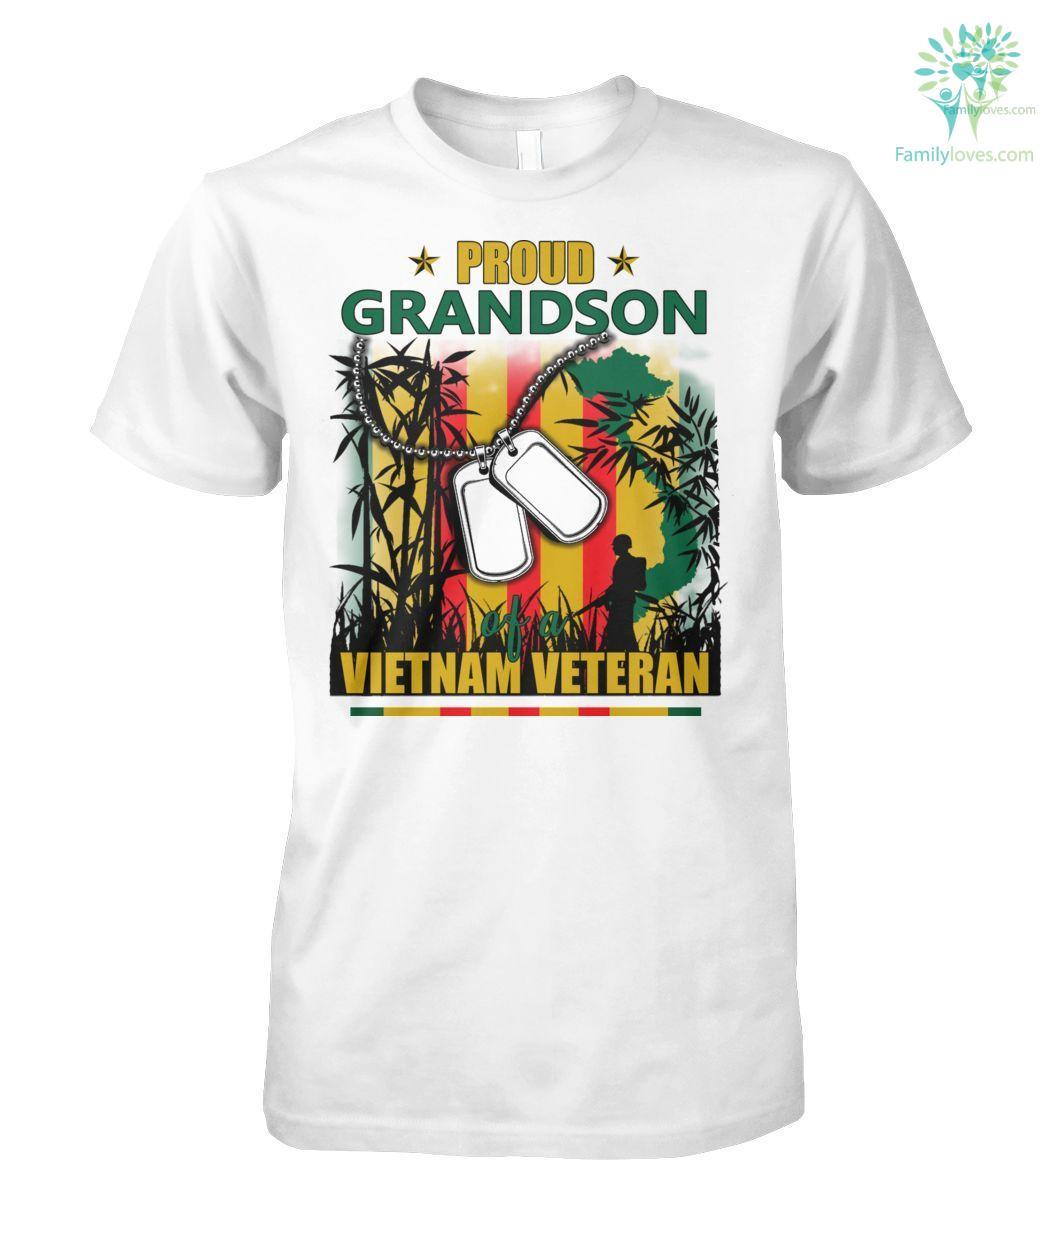 Proud Grandson of a Vietnam Veteran Men T-Shirt, Hoodie %tag familyloves.com